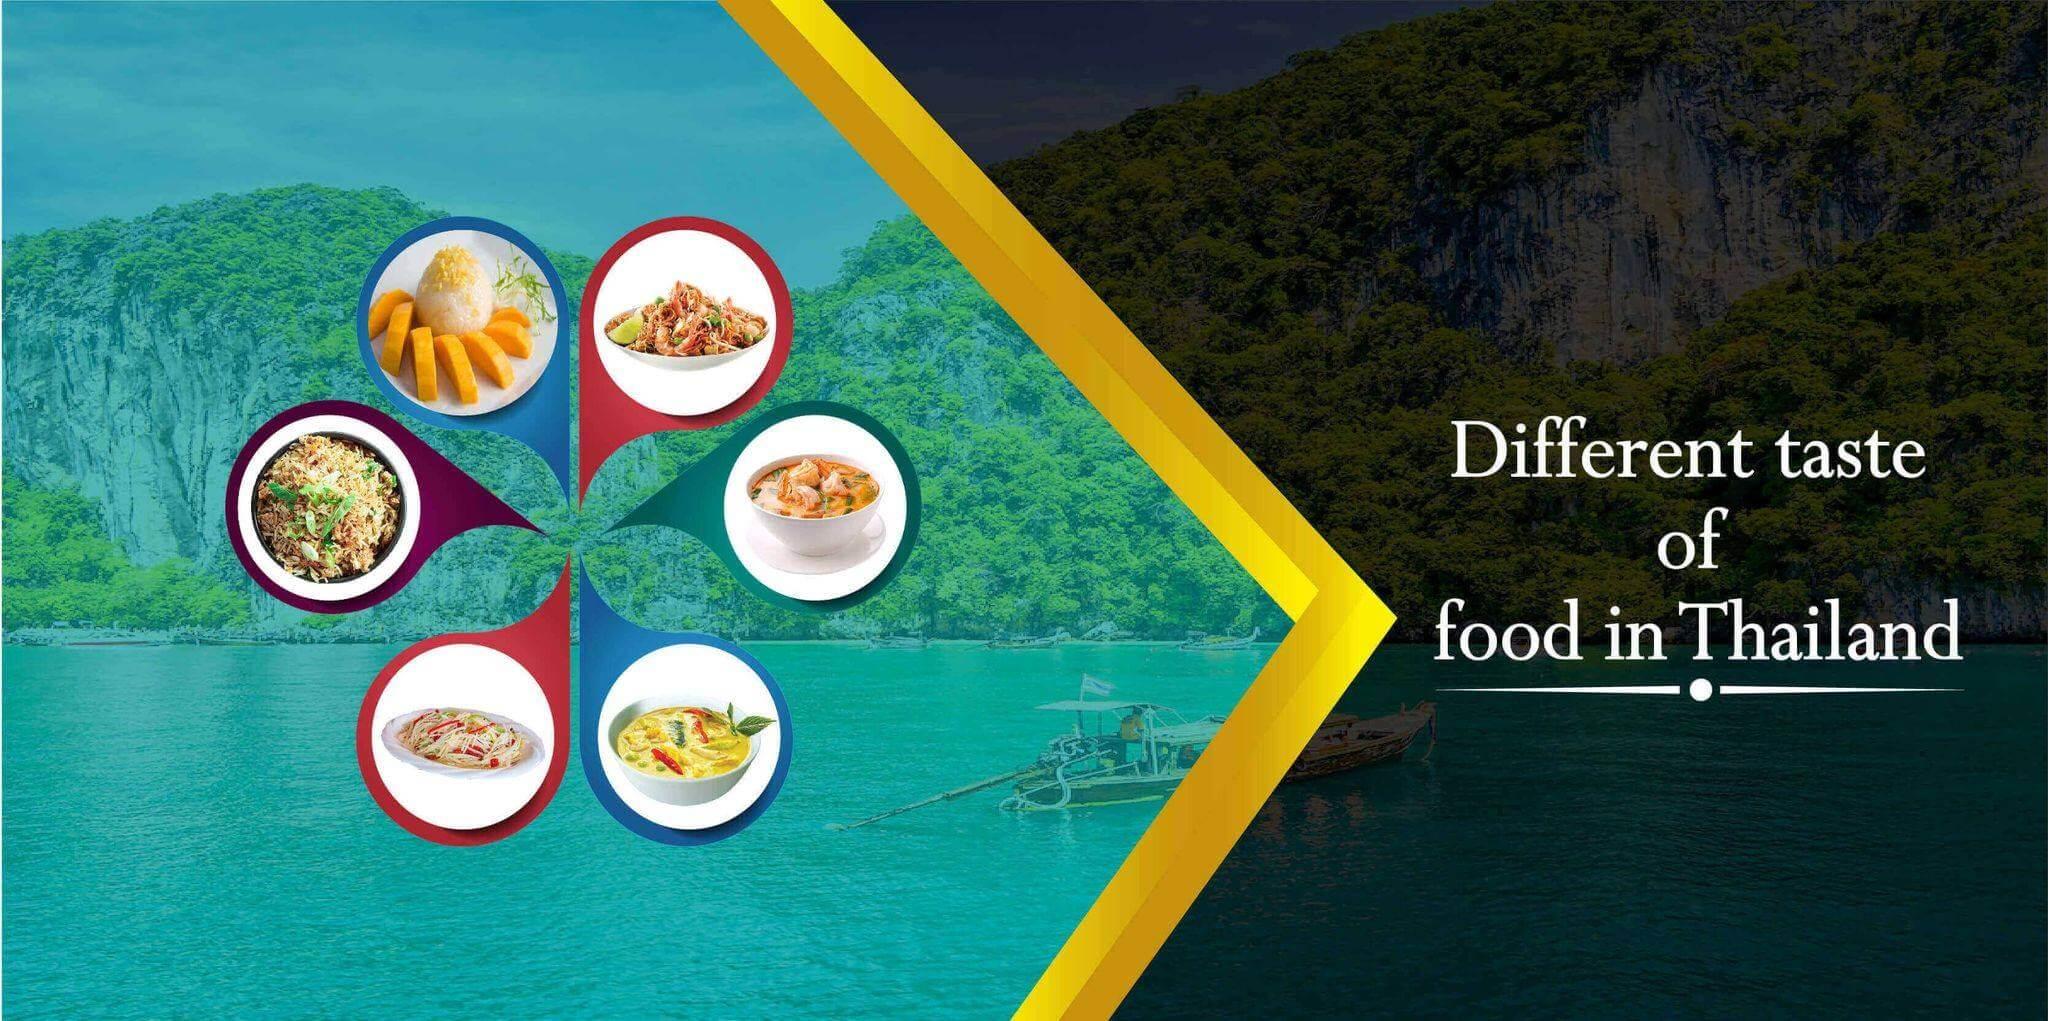 Different taste of food in Thailand